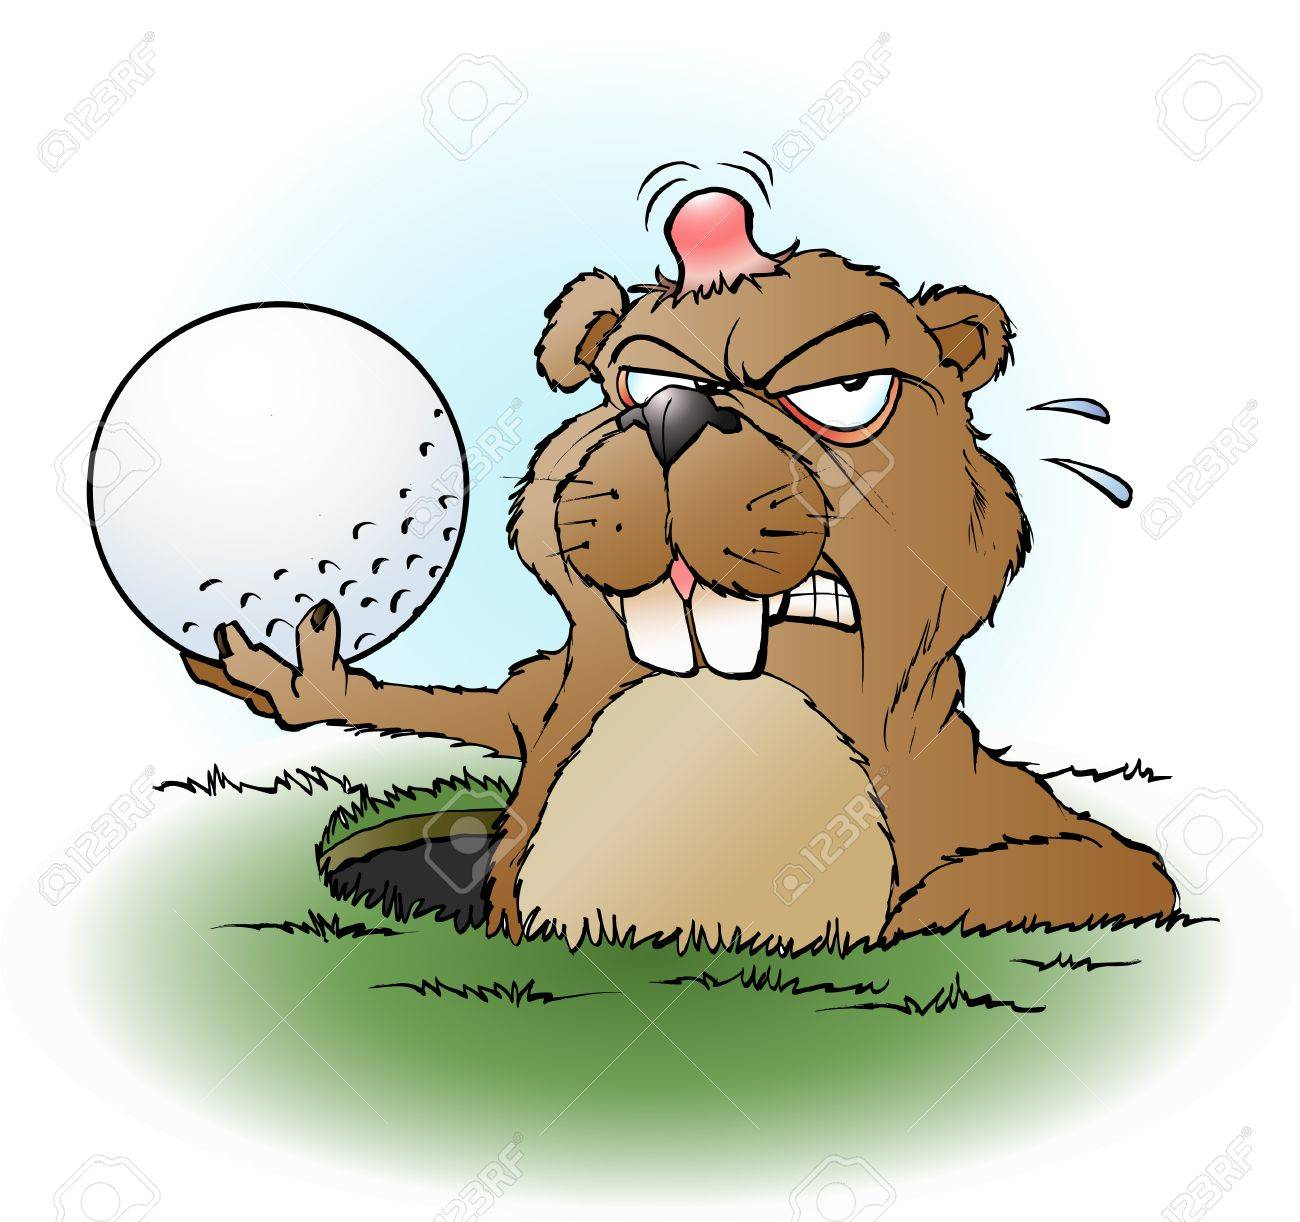 cartoon illustration of an angry prairie dog with a golf ball - 51288864